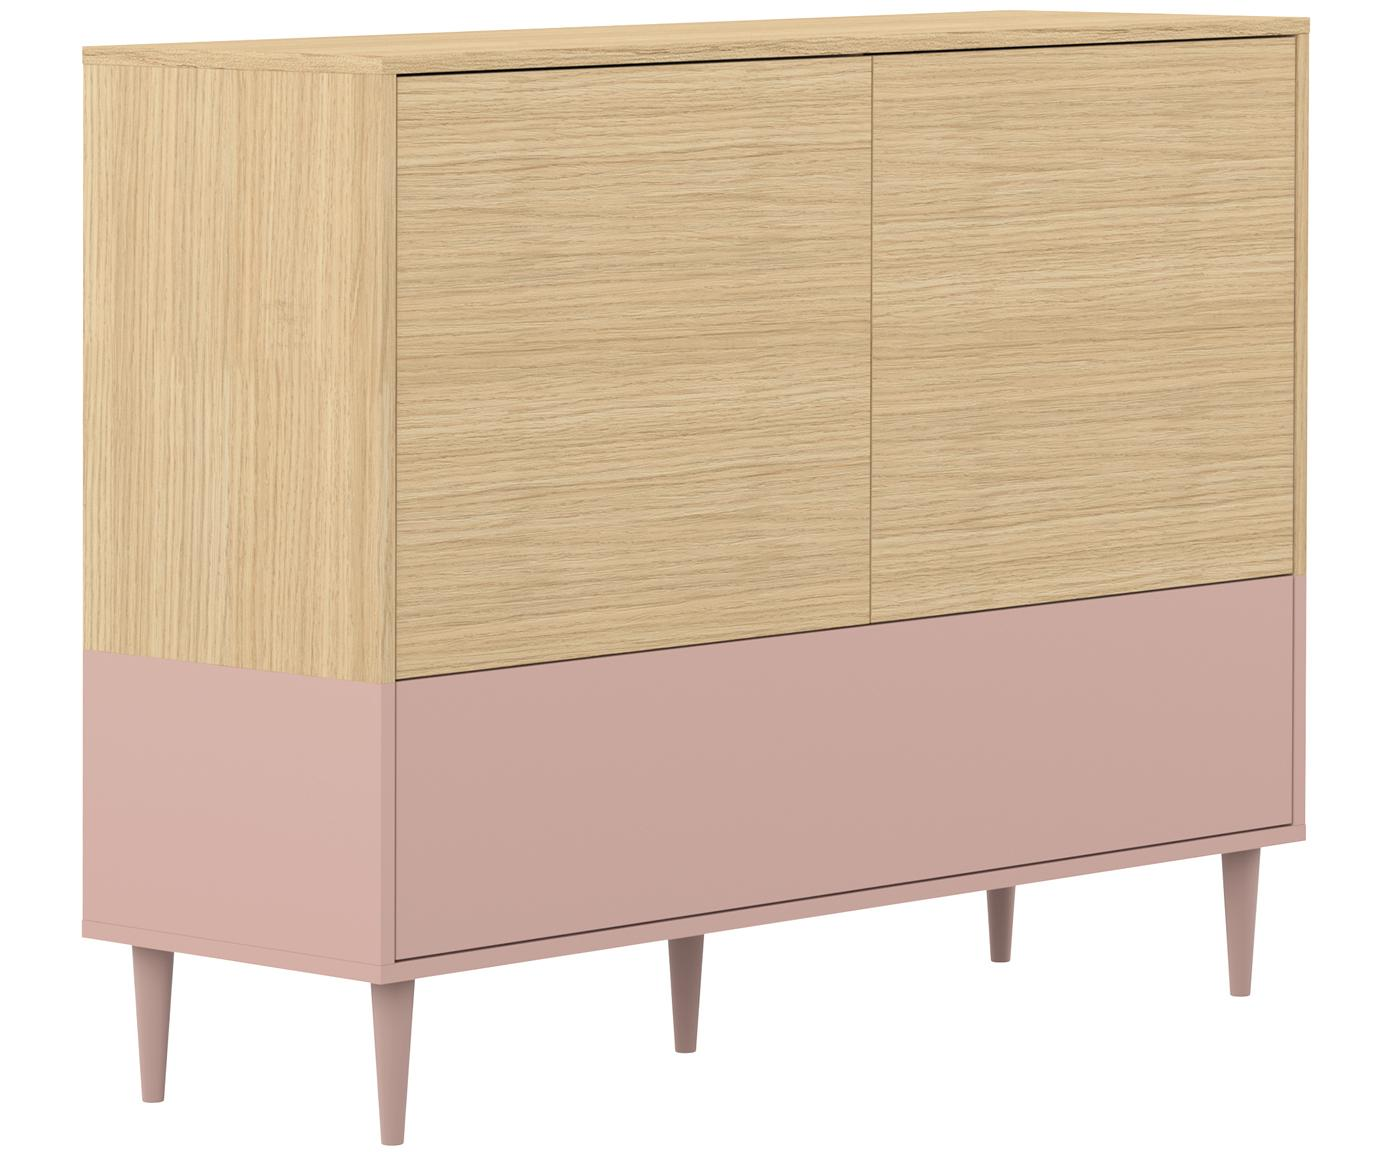 Sideboard Horizon im Skandi Design, Korpus: Spanplatte, melaminbeschi, Eichenholz, Altrosa, 120 x 95 cm